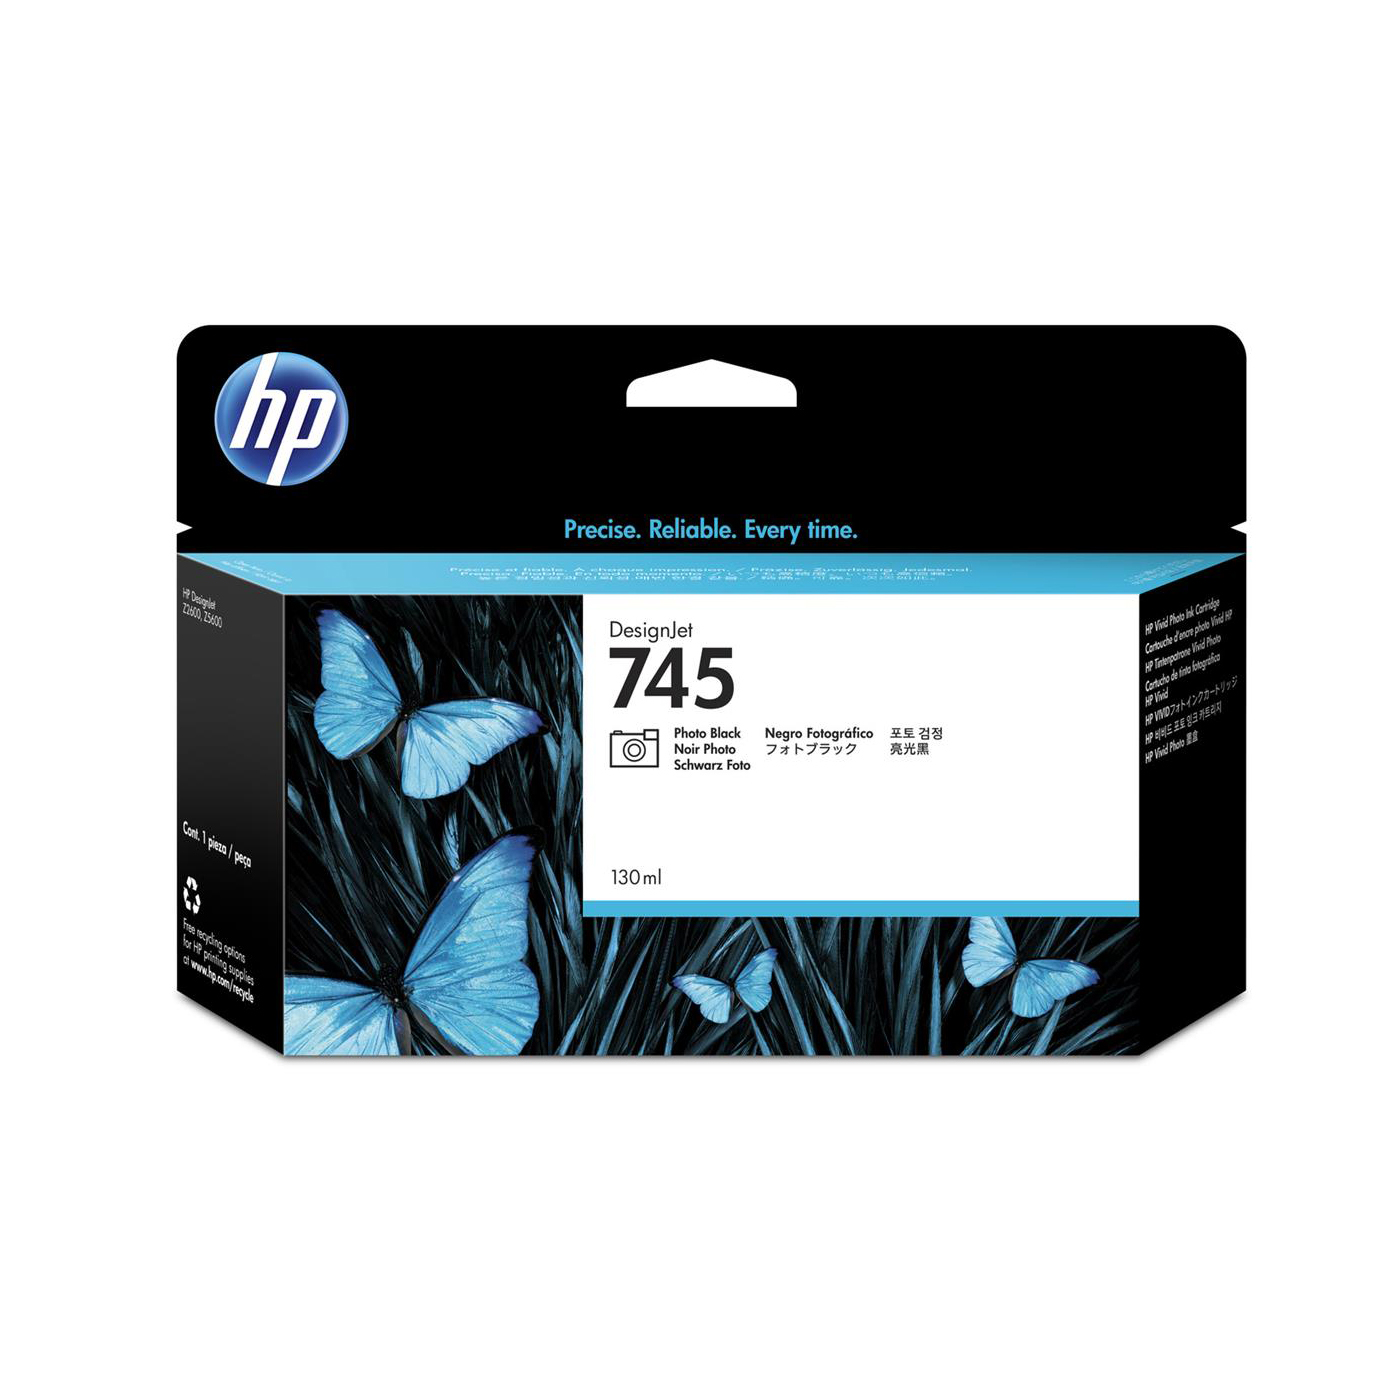 HP 745 130ml DesignJet Photo Black Ink Cartridge F9J98A *3 to 5 Day Leadtime*